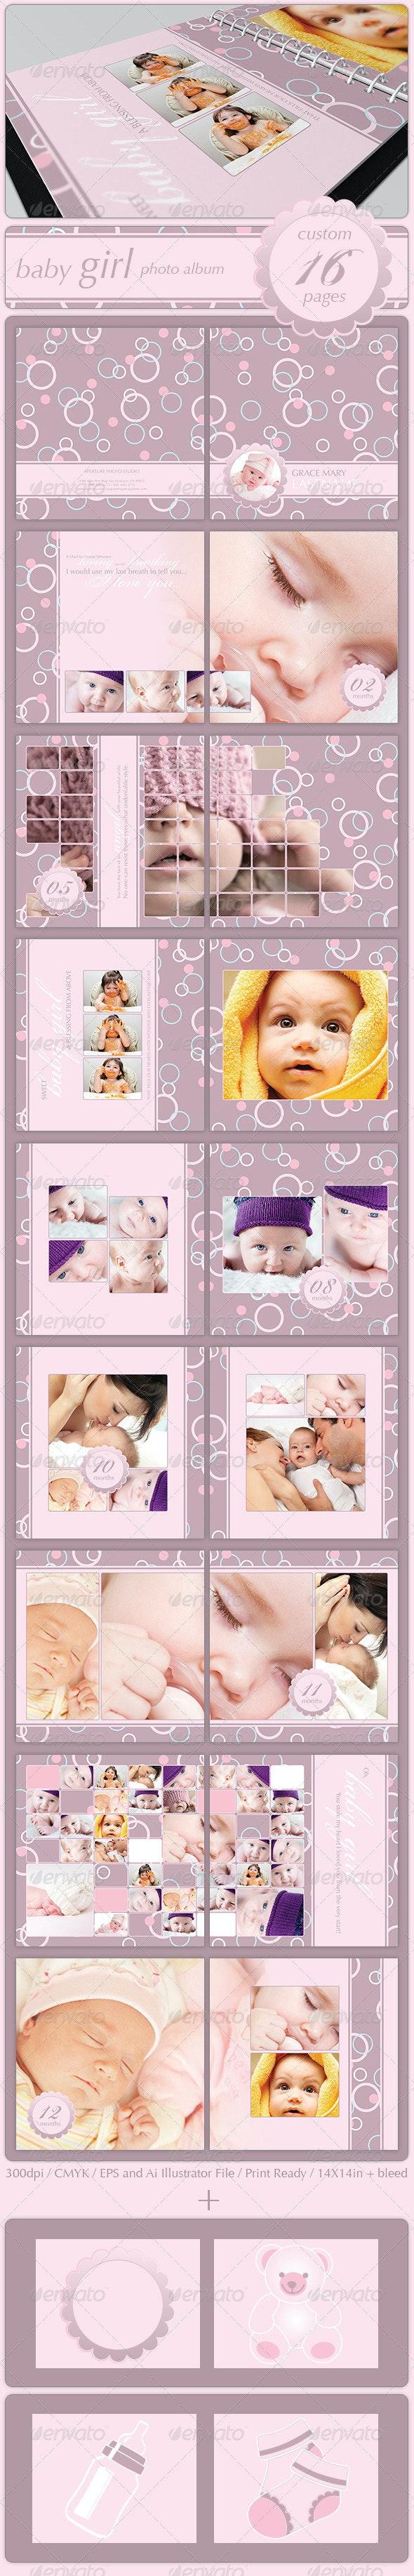 Baby Girl Photo Album - Photo Albums Print Templates